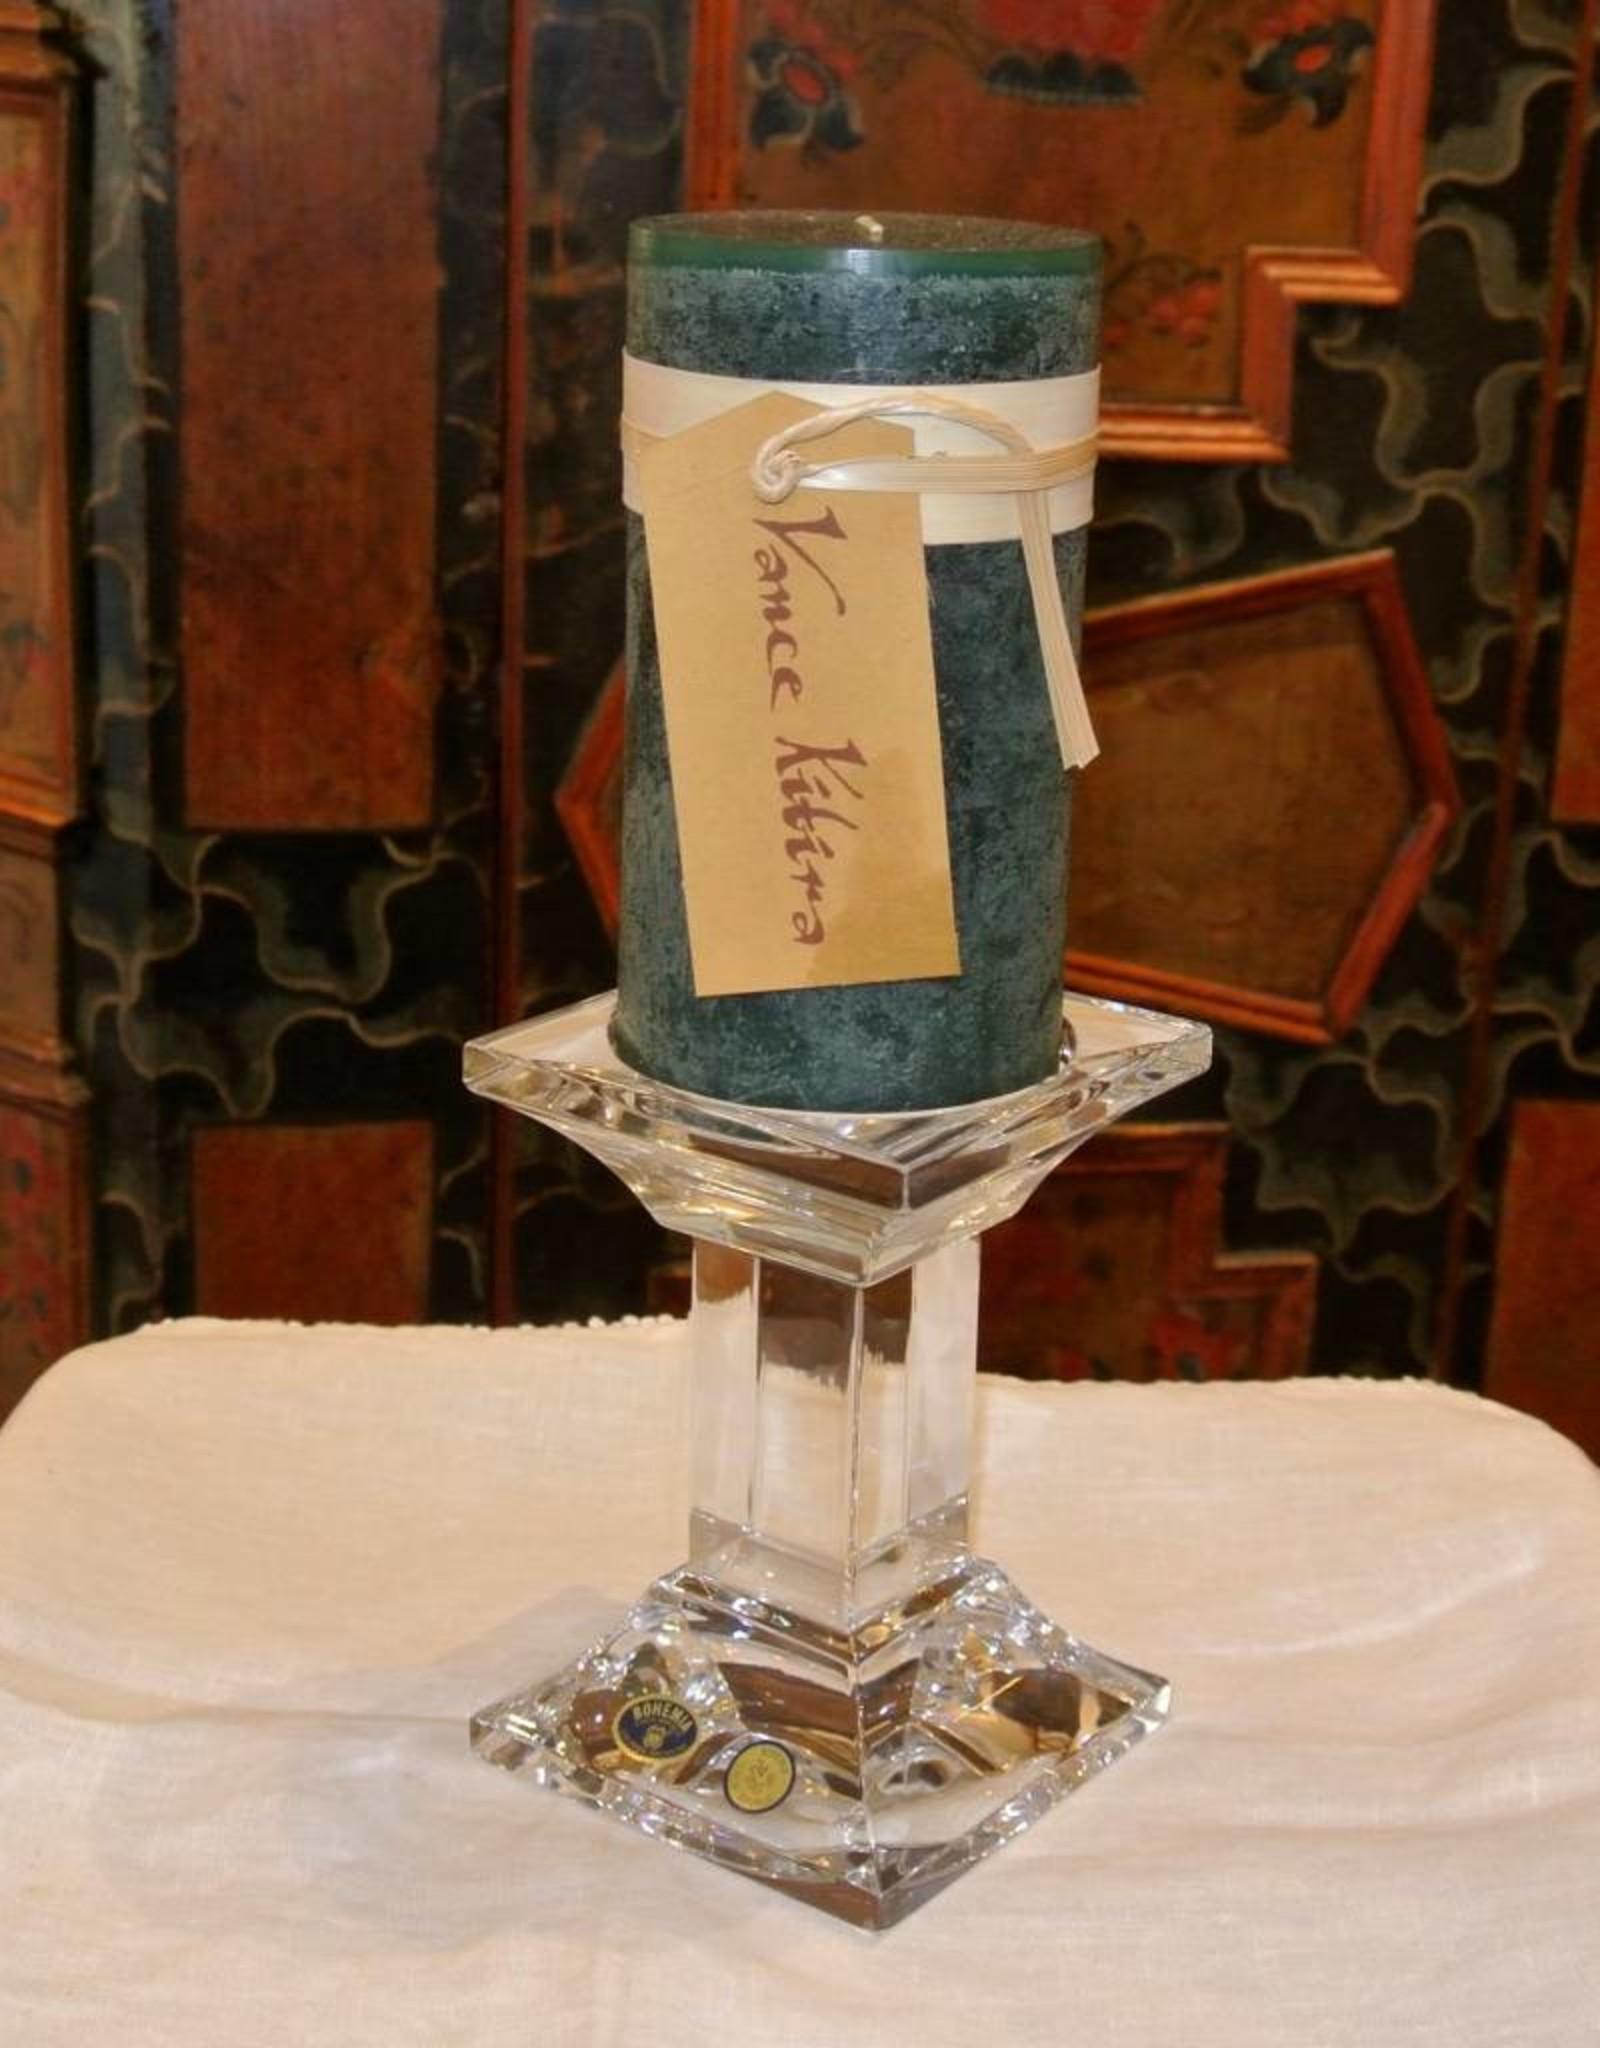 Timber Candle 3.25x6 Evergreen- Vance Kitira